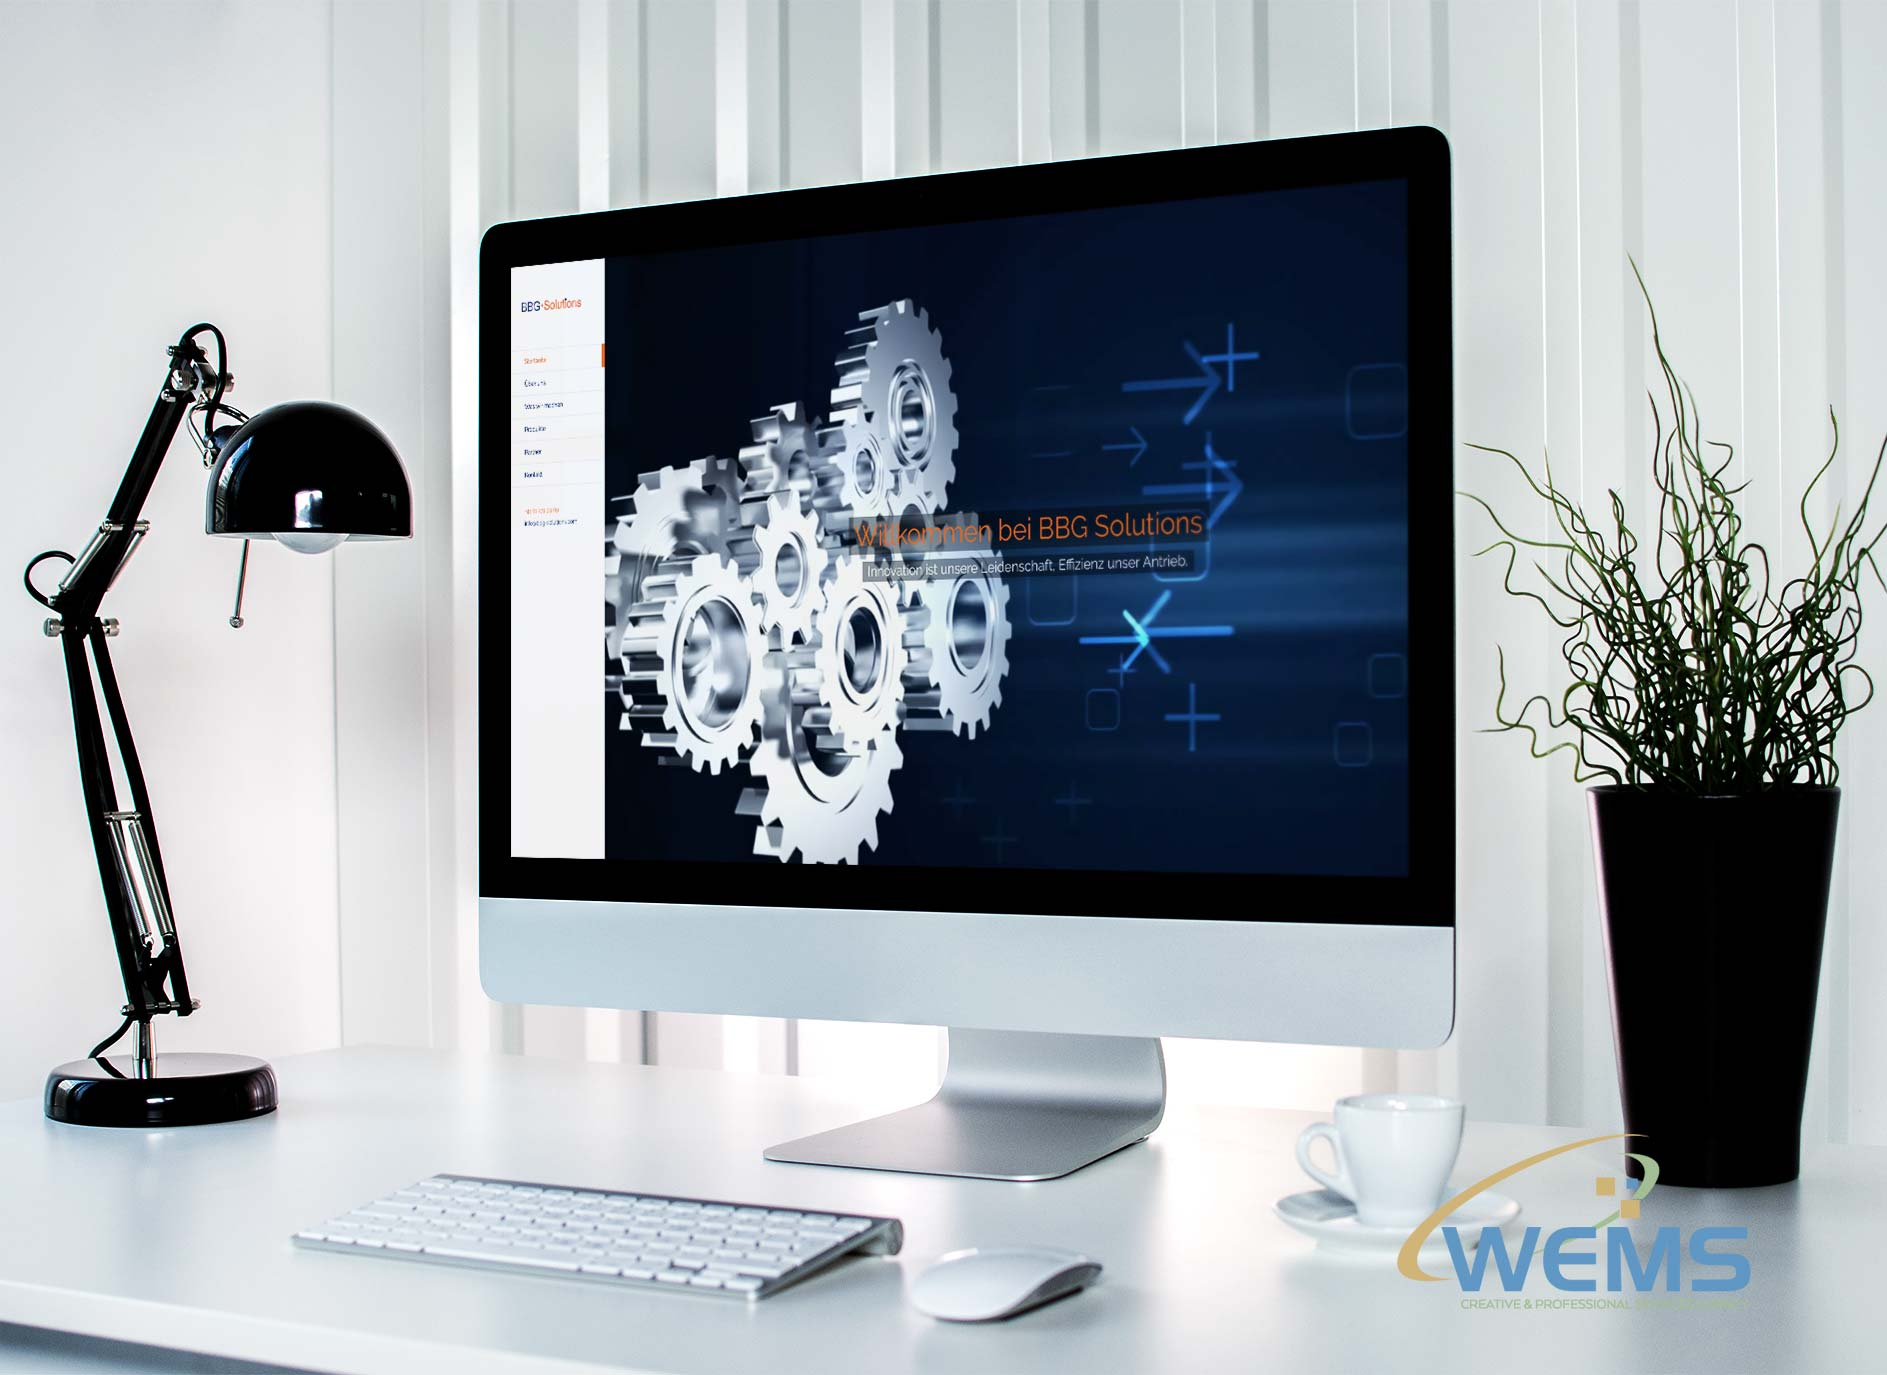 wems agency webdesign mockup bbg solutions - Webdesign und Suchmaschinenoptimierung (SEO) Agentur